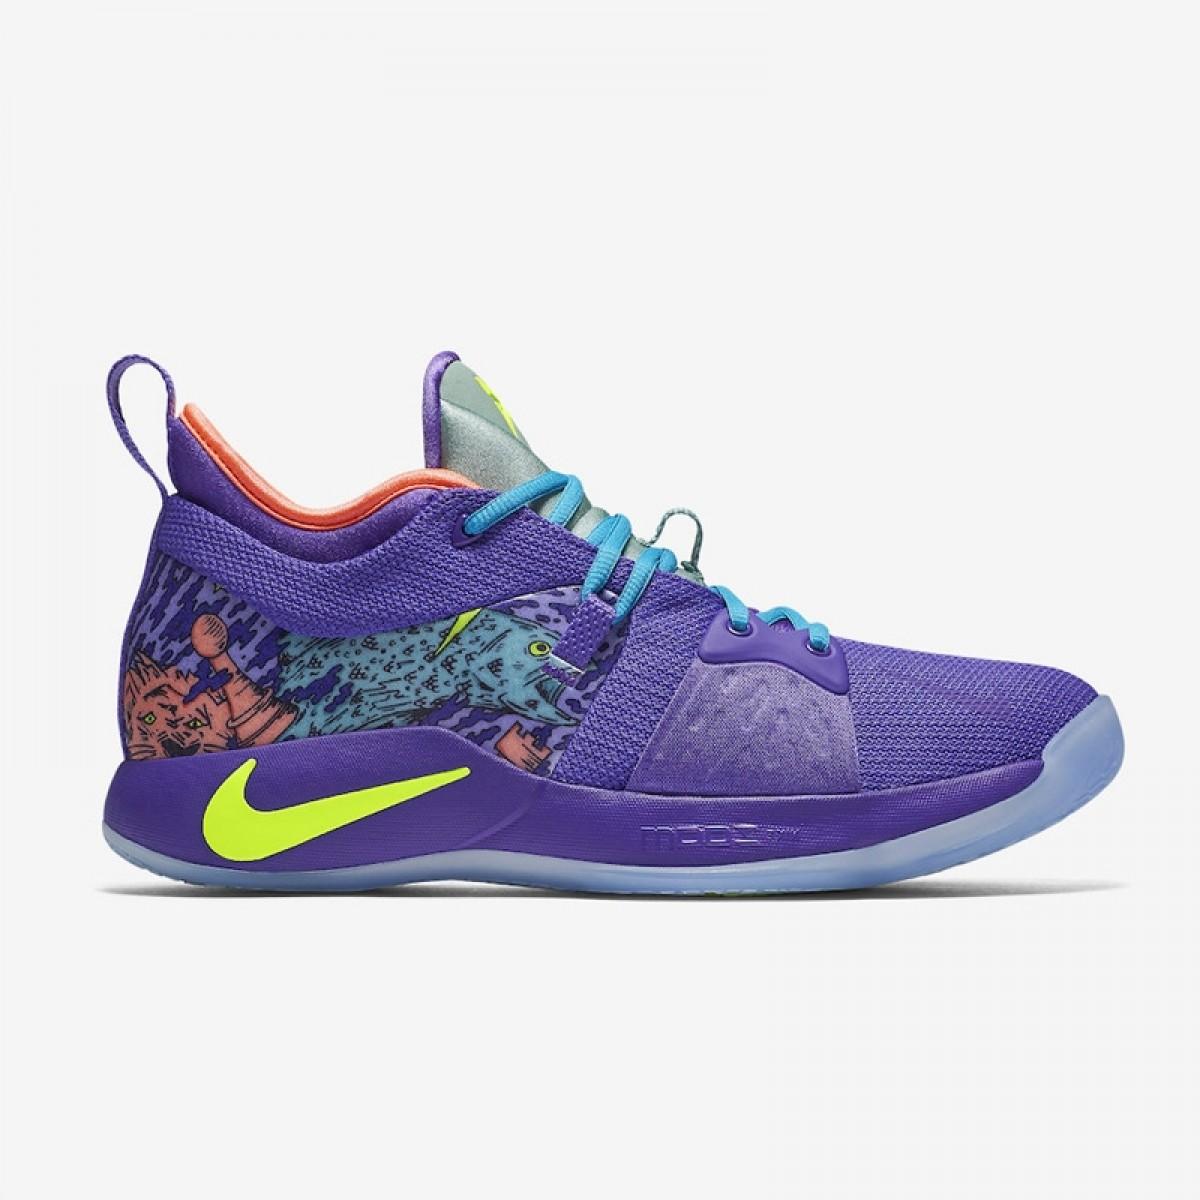 Nike PG2 'Mamba Mentality'